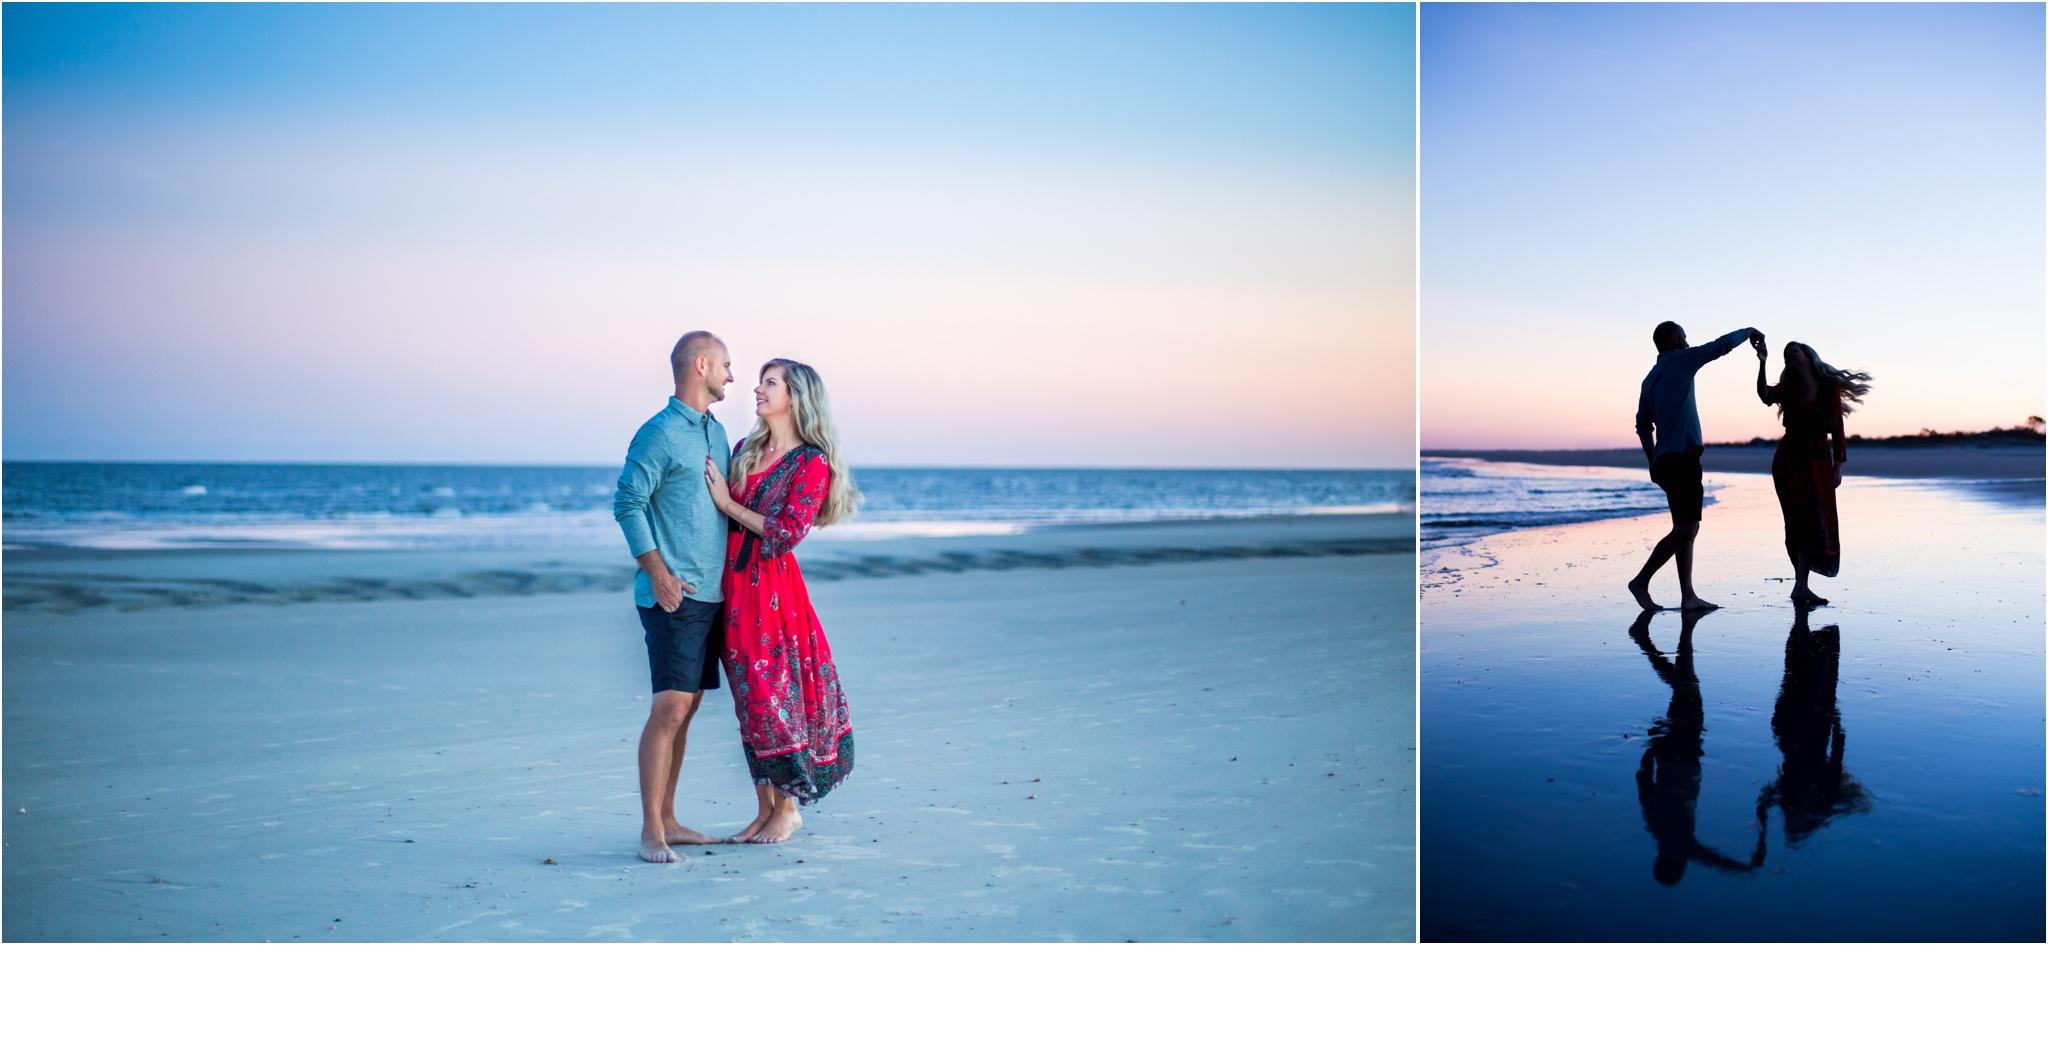 Rainey_Gregg_Photography_St._Simons_Island_Georgia_California_Wedding_Portrait_Photography_0270.jpg